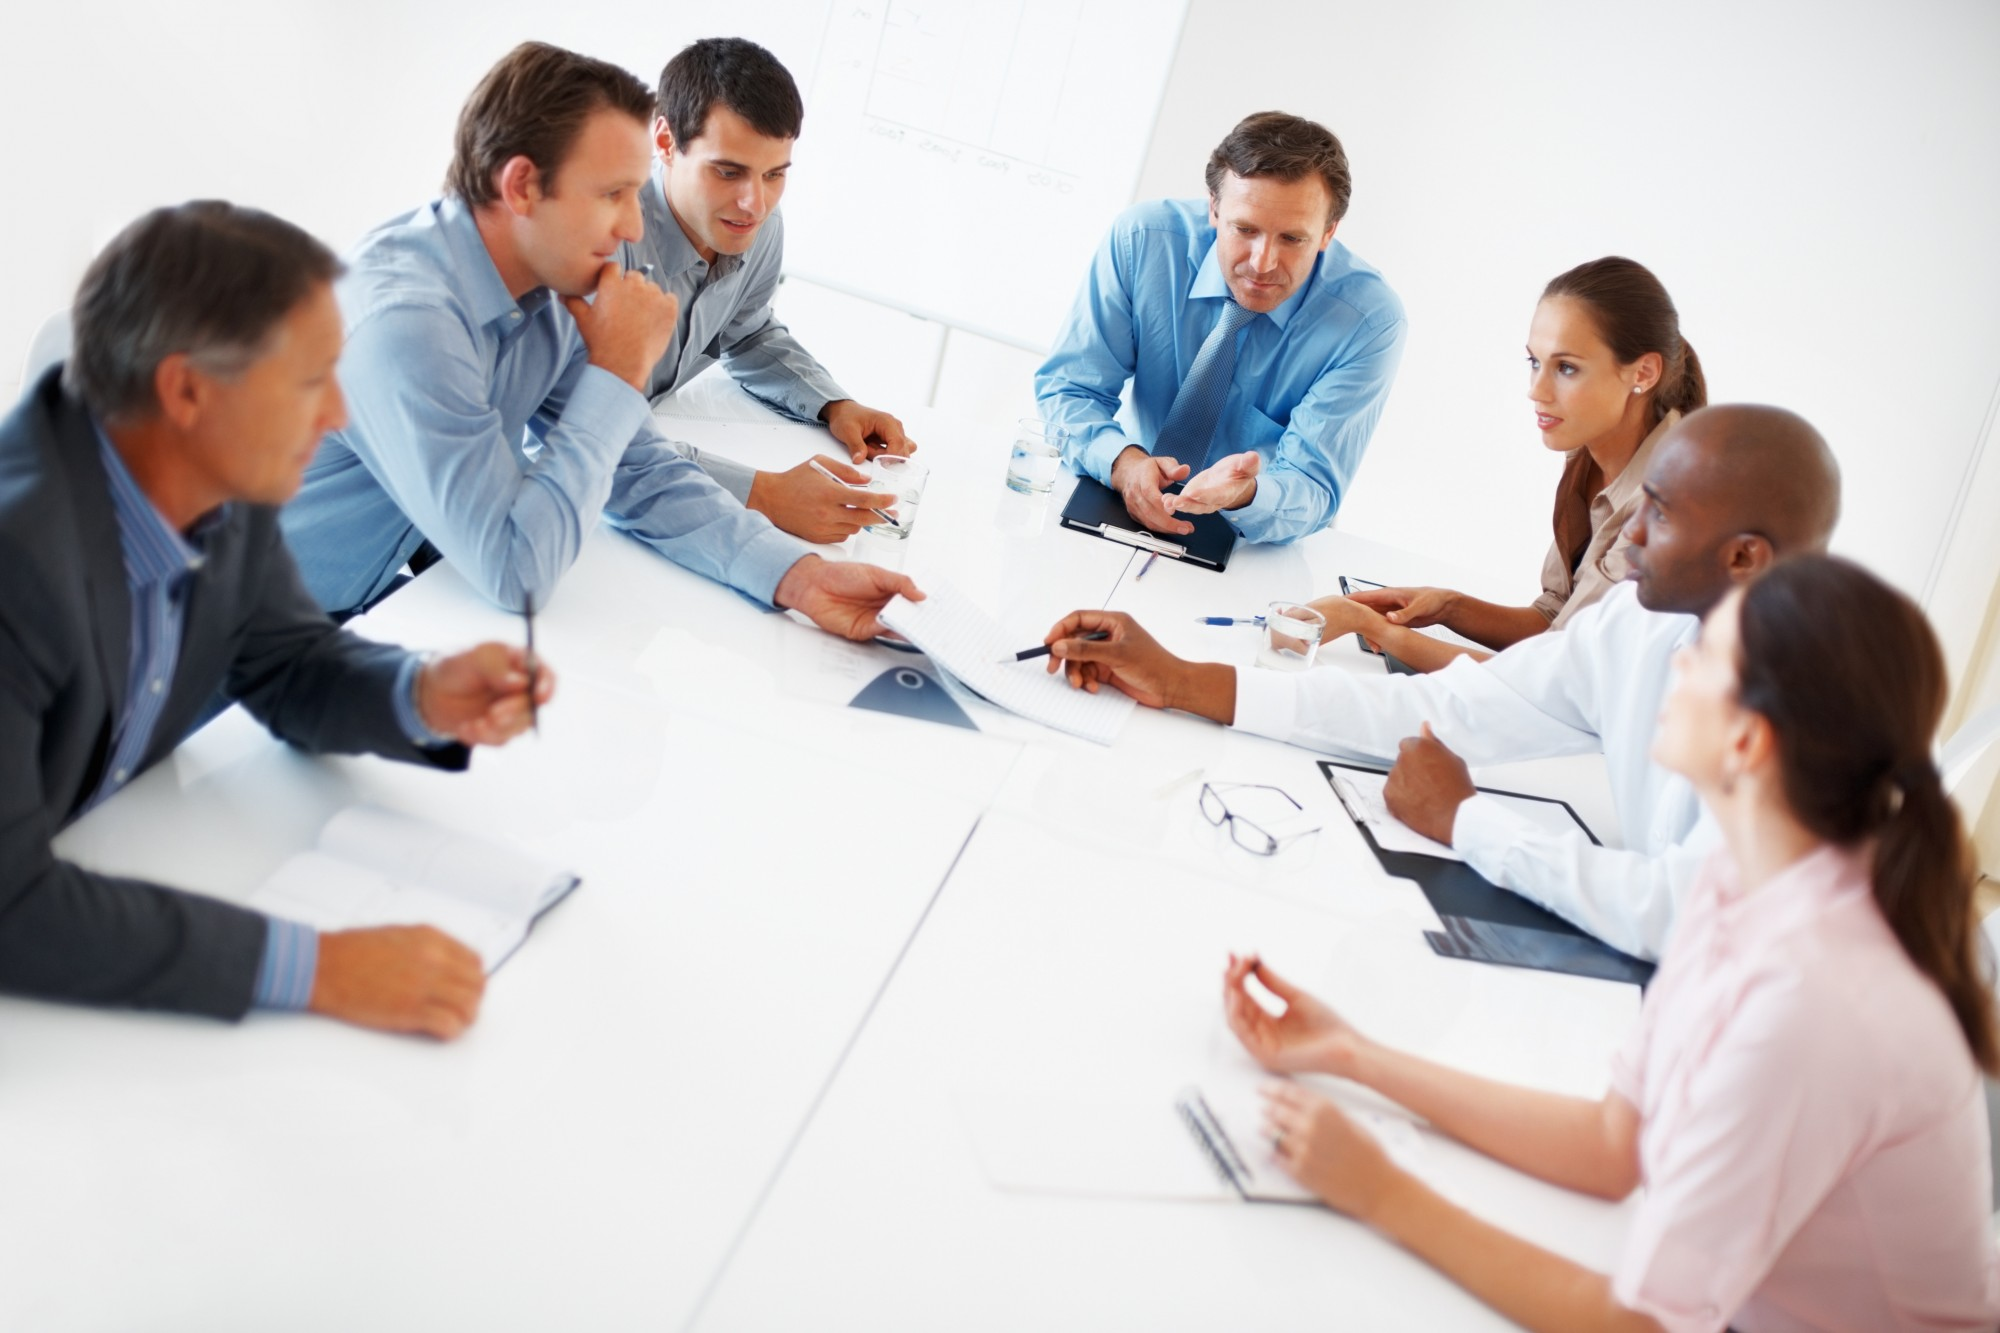 photodune-652300-business-conversation-xl-e1393454728339